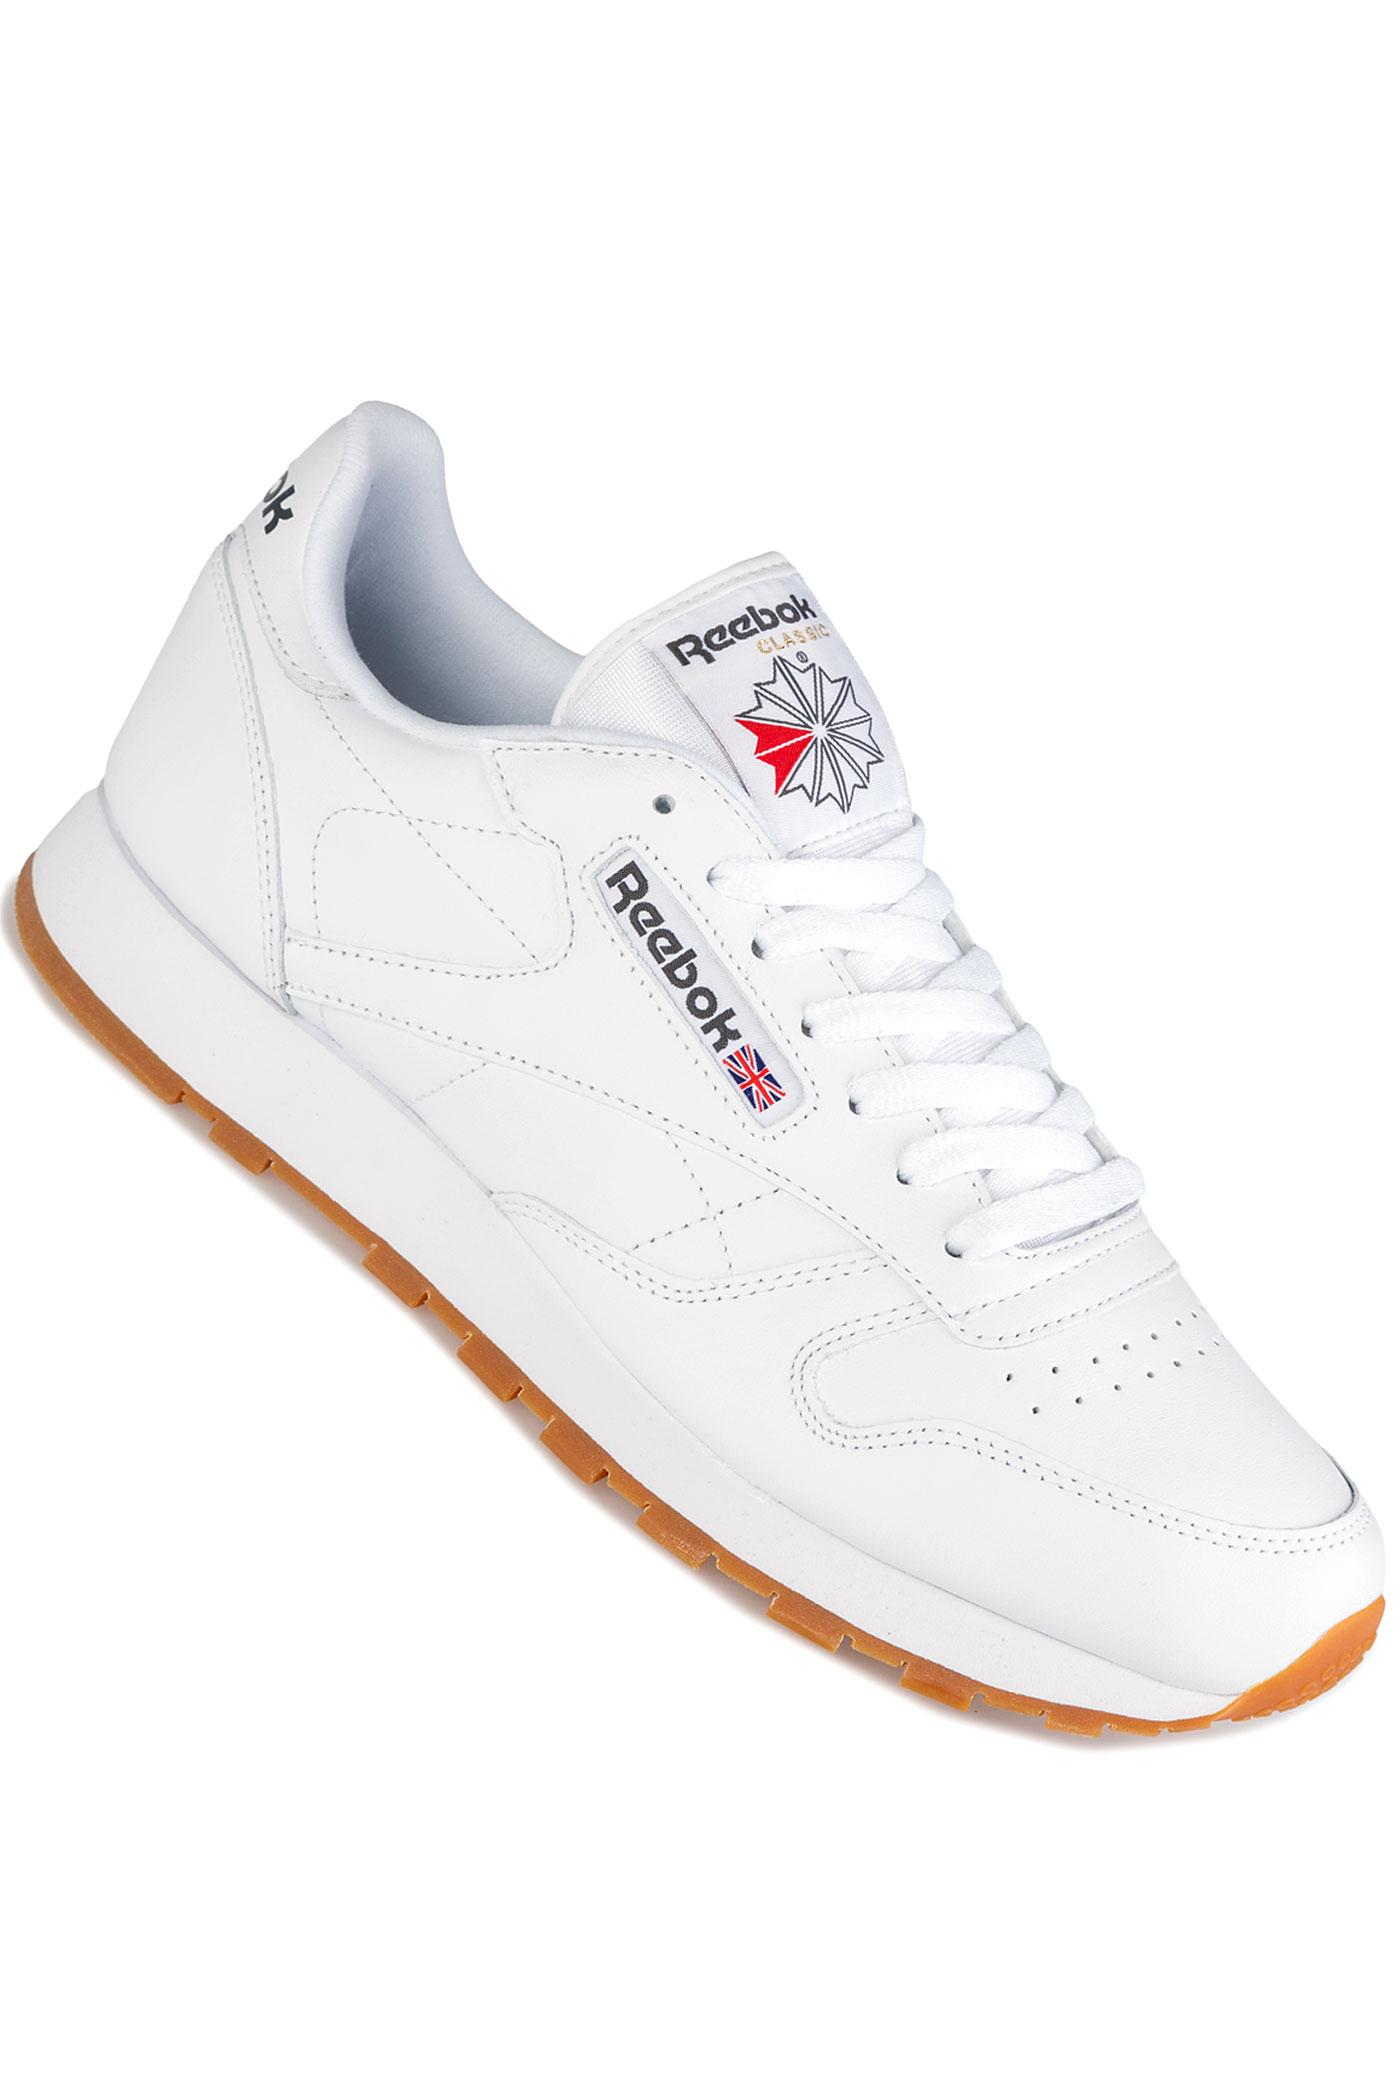 reebok classic leather chaussure white gum achetez sur skatedeluxe. Black Bedroom Furniture Sets. Home Design Ideas